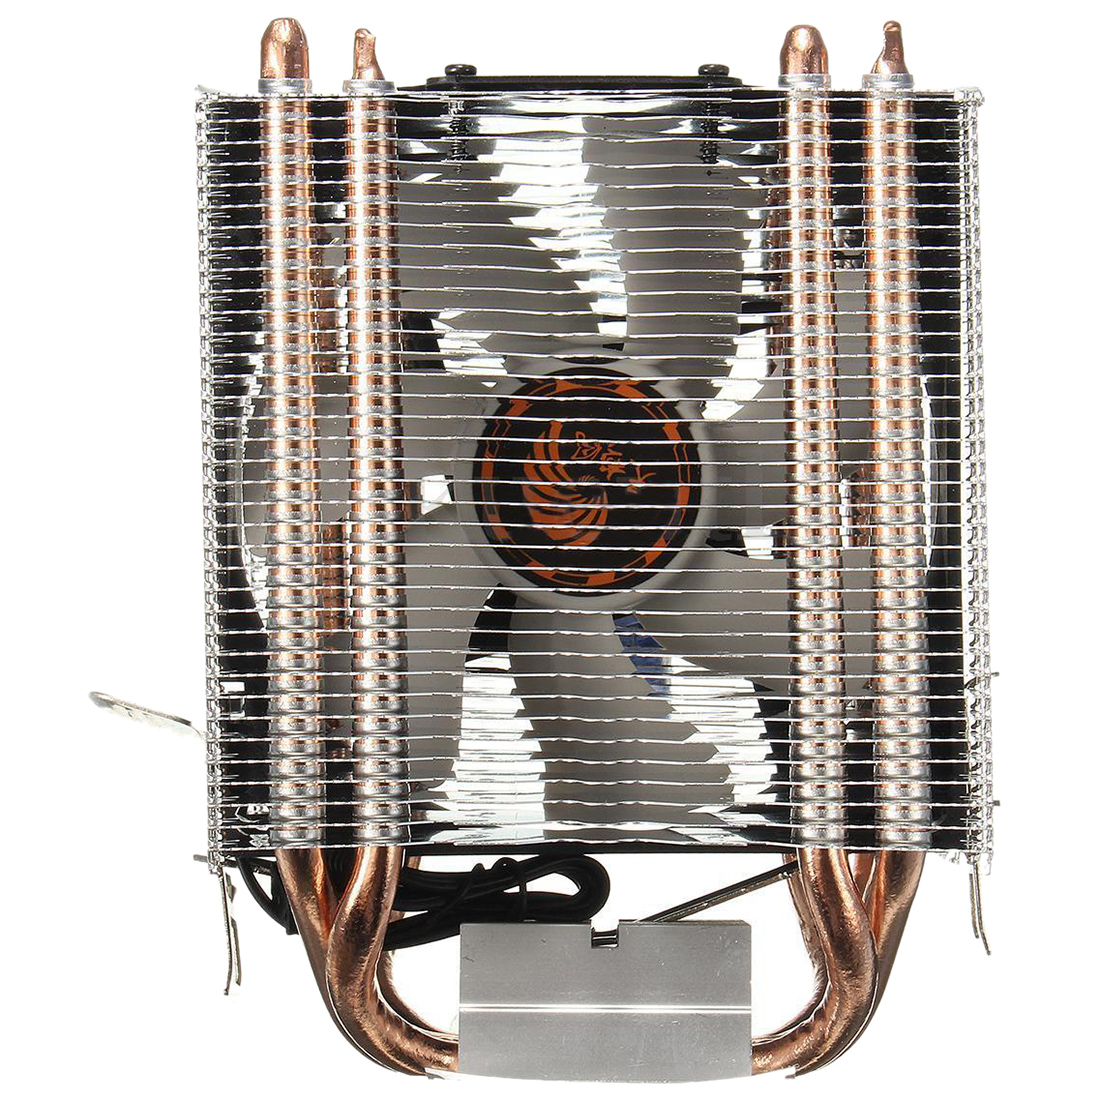 Nueva 4 Heatpipe CPU Cooler disipador de calor para Intel LGA 1150 1151 1155 775 1156 (para AMD)